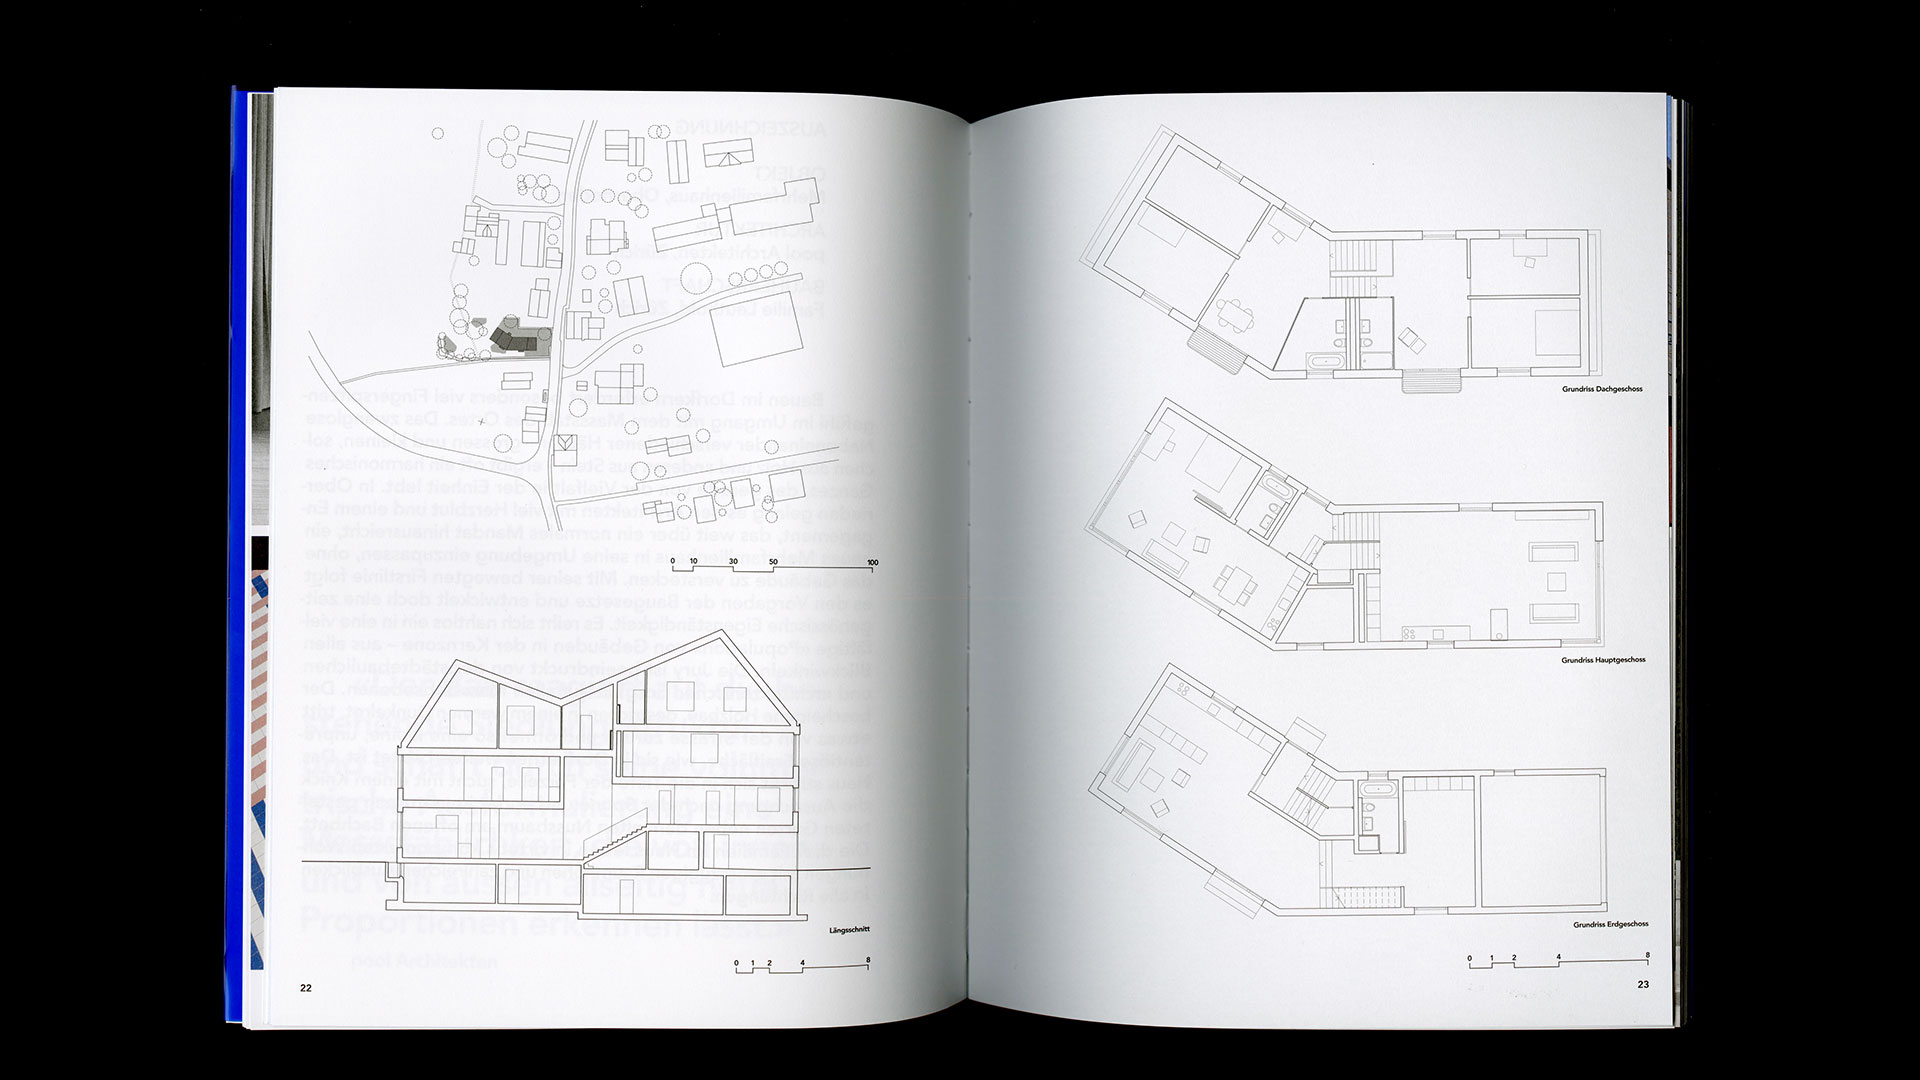 AndreasHaenggi_ArchitekturPreisKantonZuerich_7.6.jpg